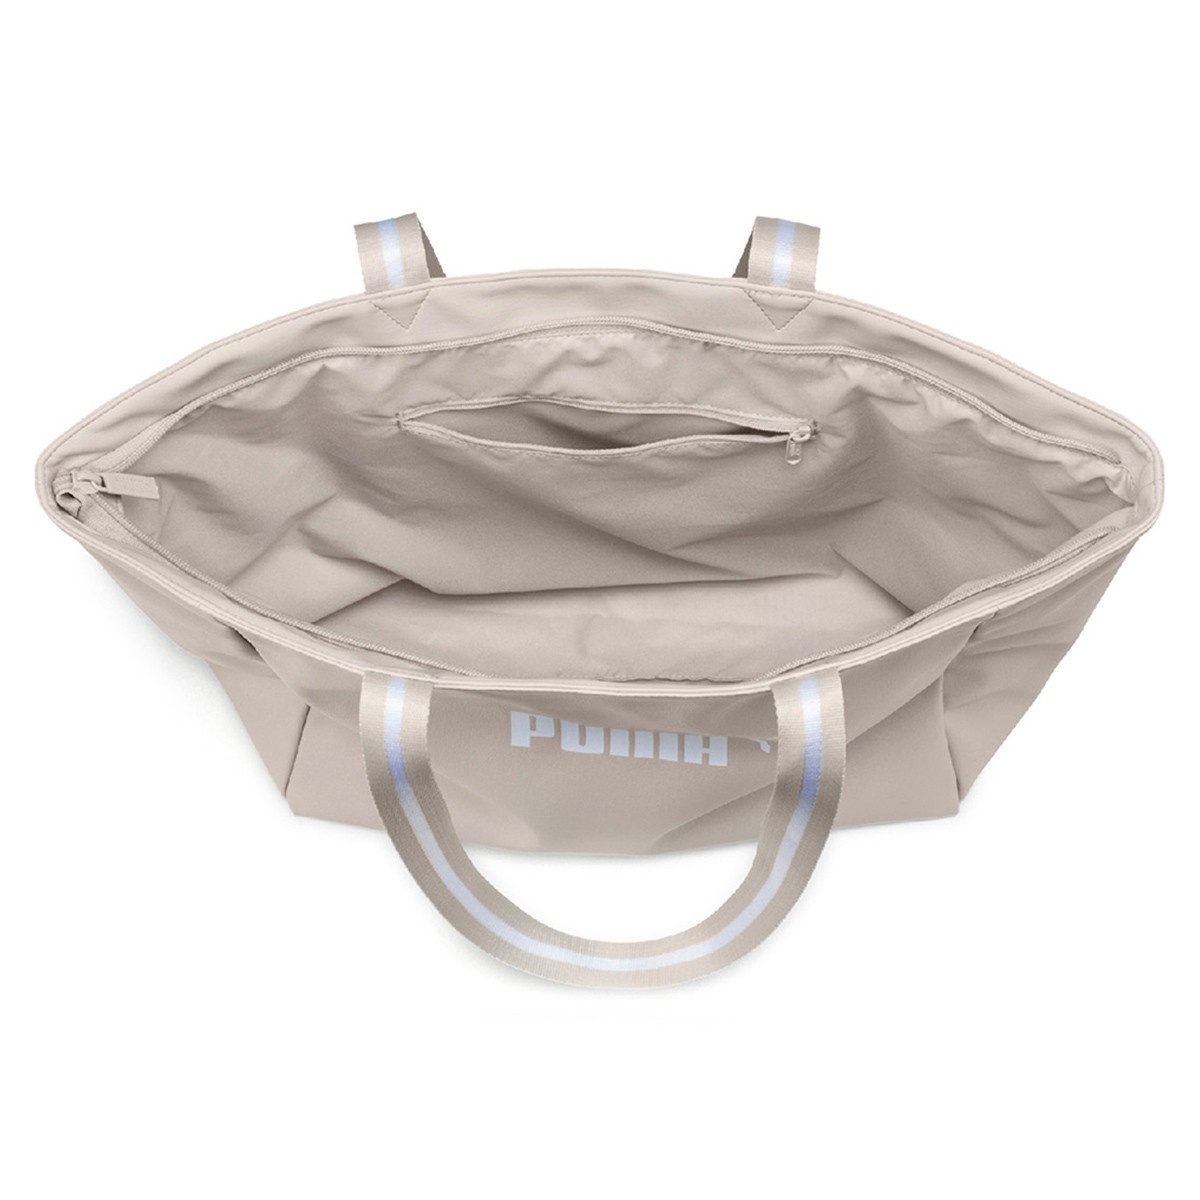 Bolsa Puma WMN Core Up Large Shopper - Bege - Feminina